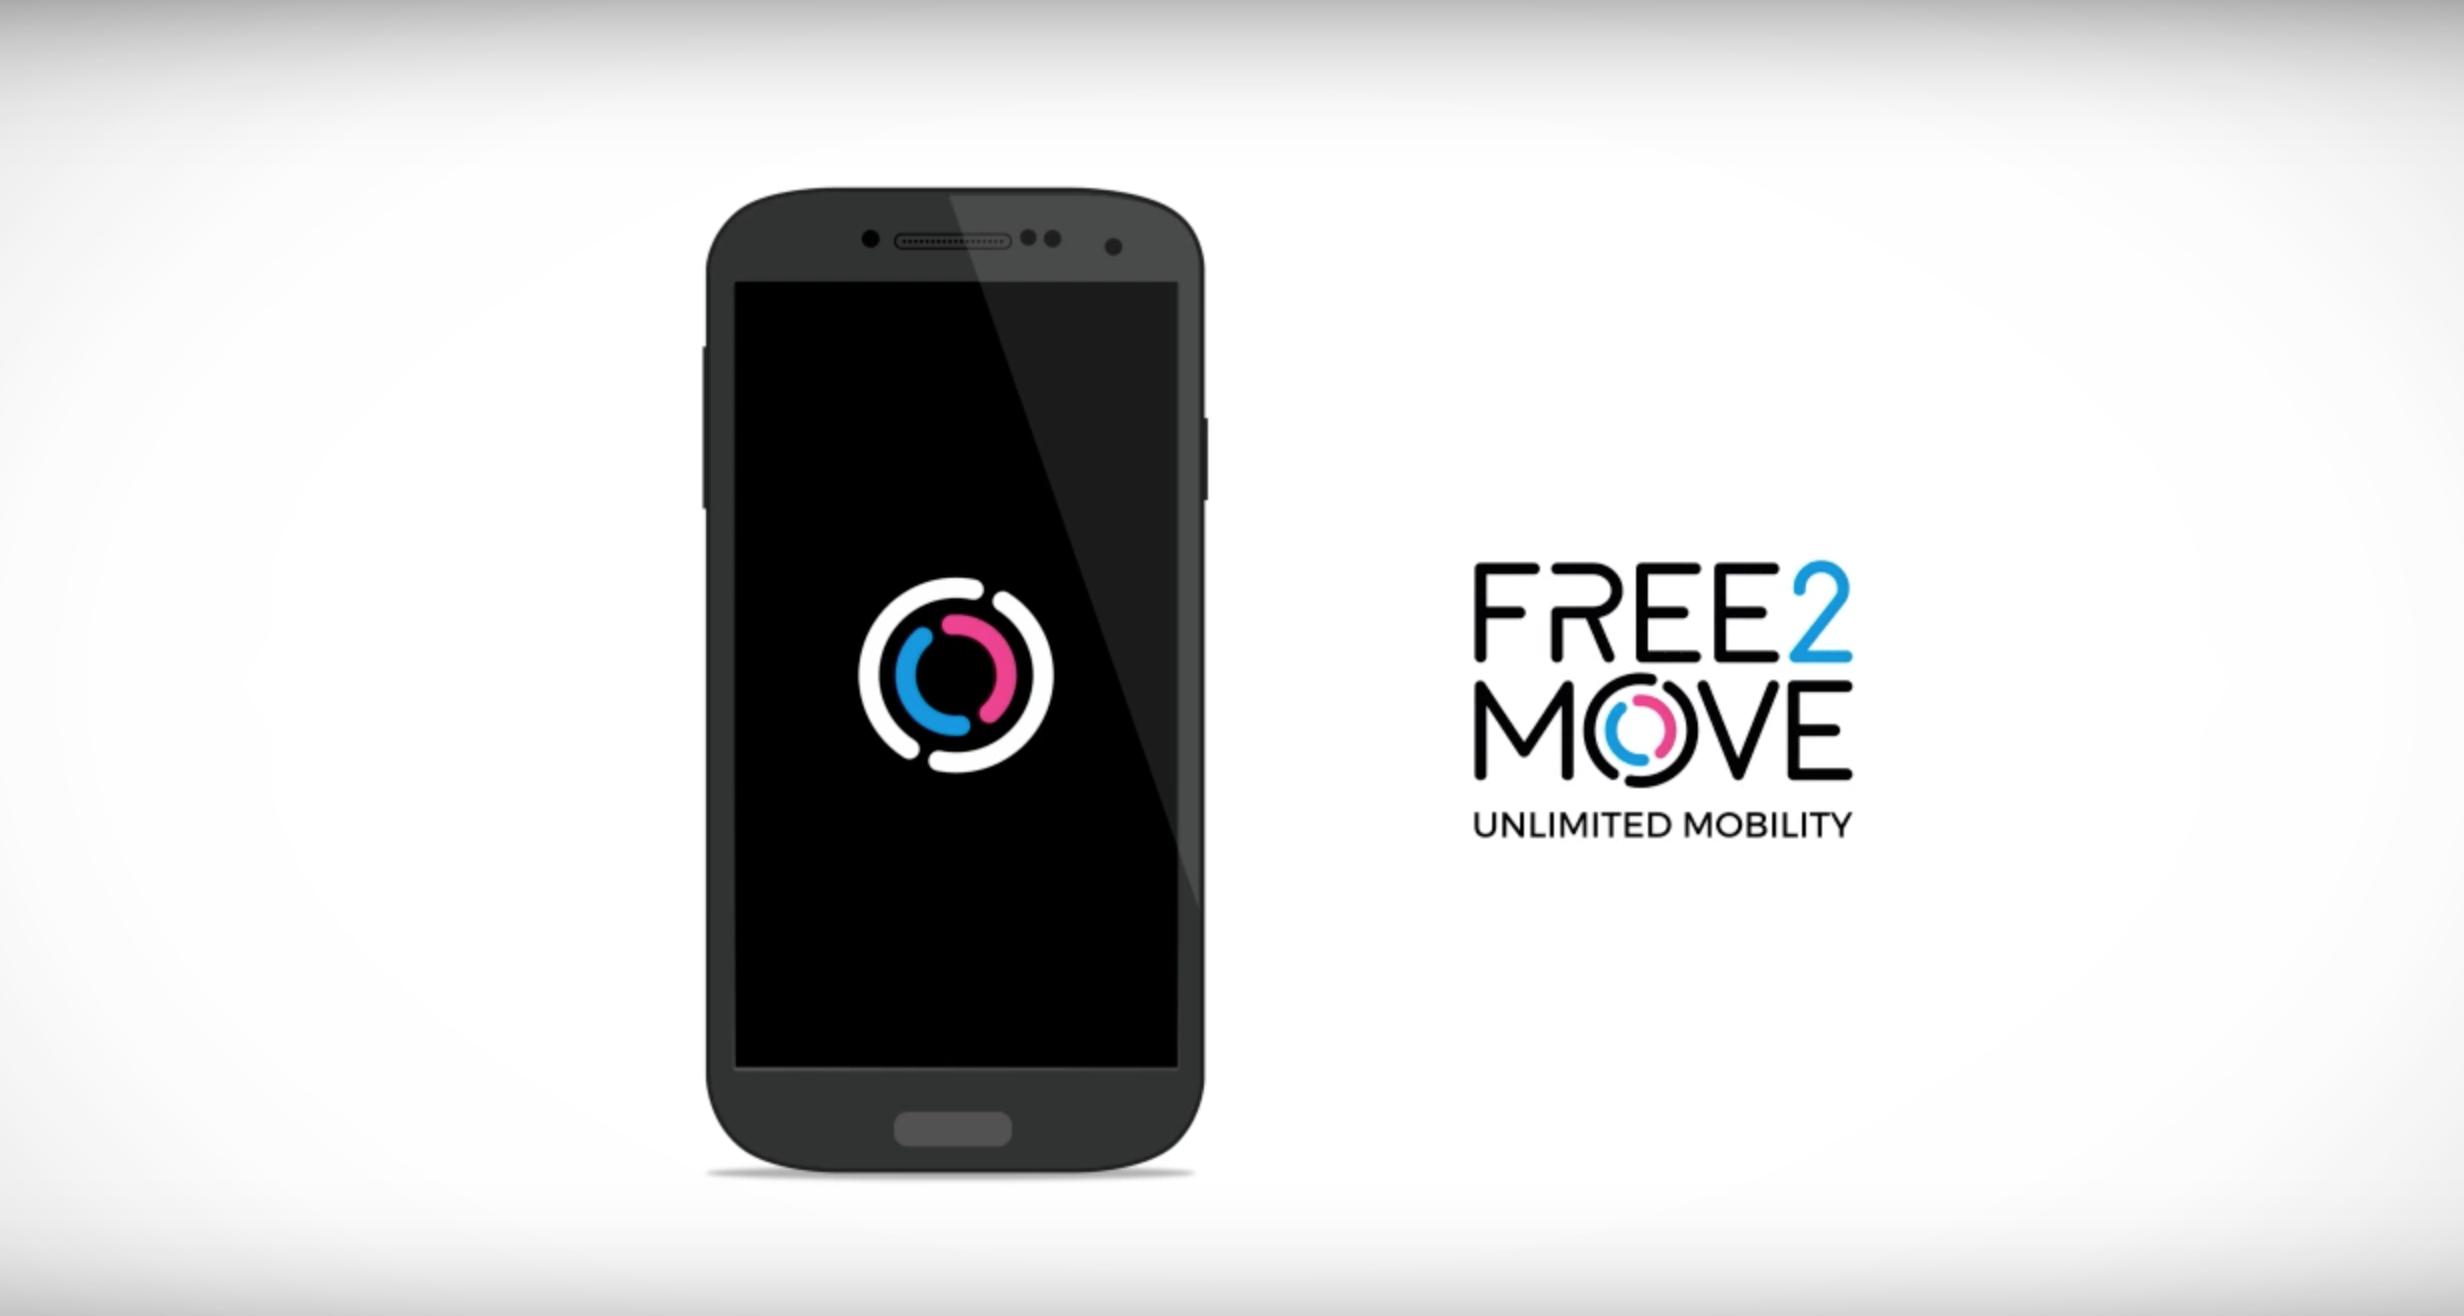 le groupe psa lance une appli globale de mobilit free2move link2fleet for a smarter mobility. Black Bedroom Furniture Sets. Home Design Ideas